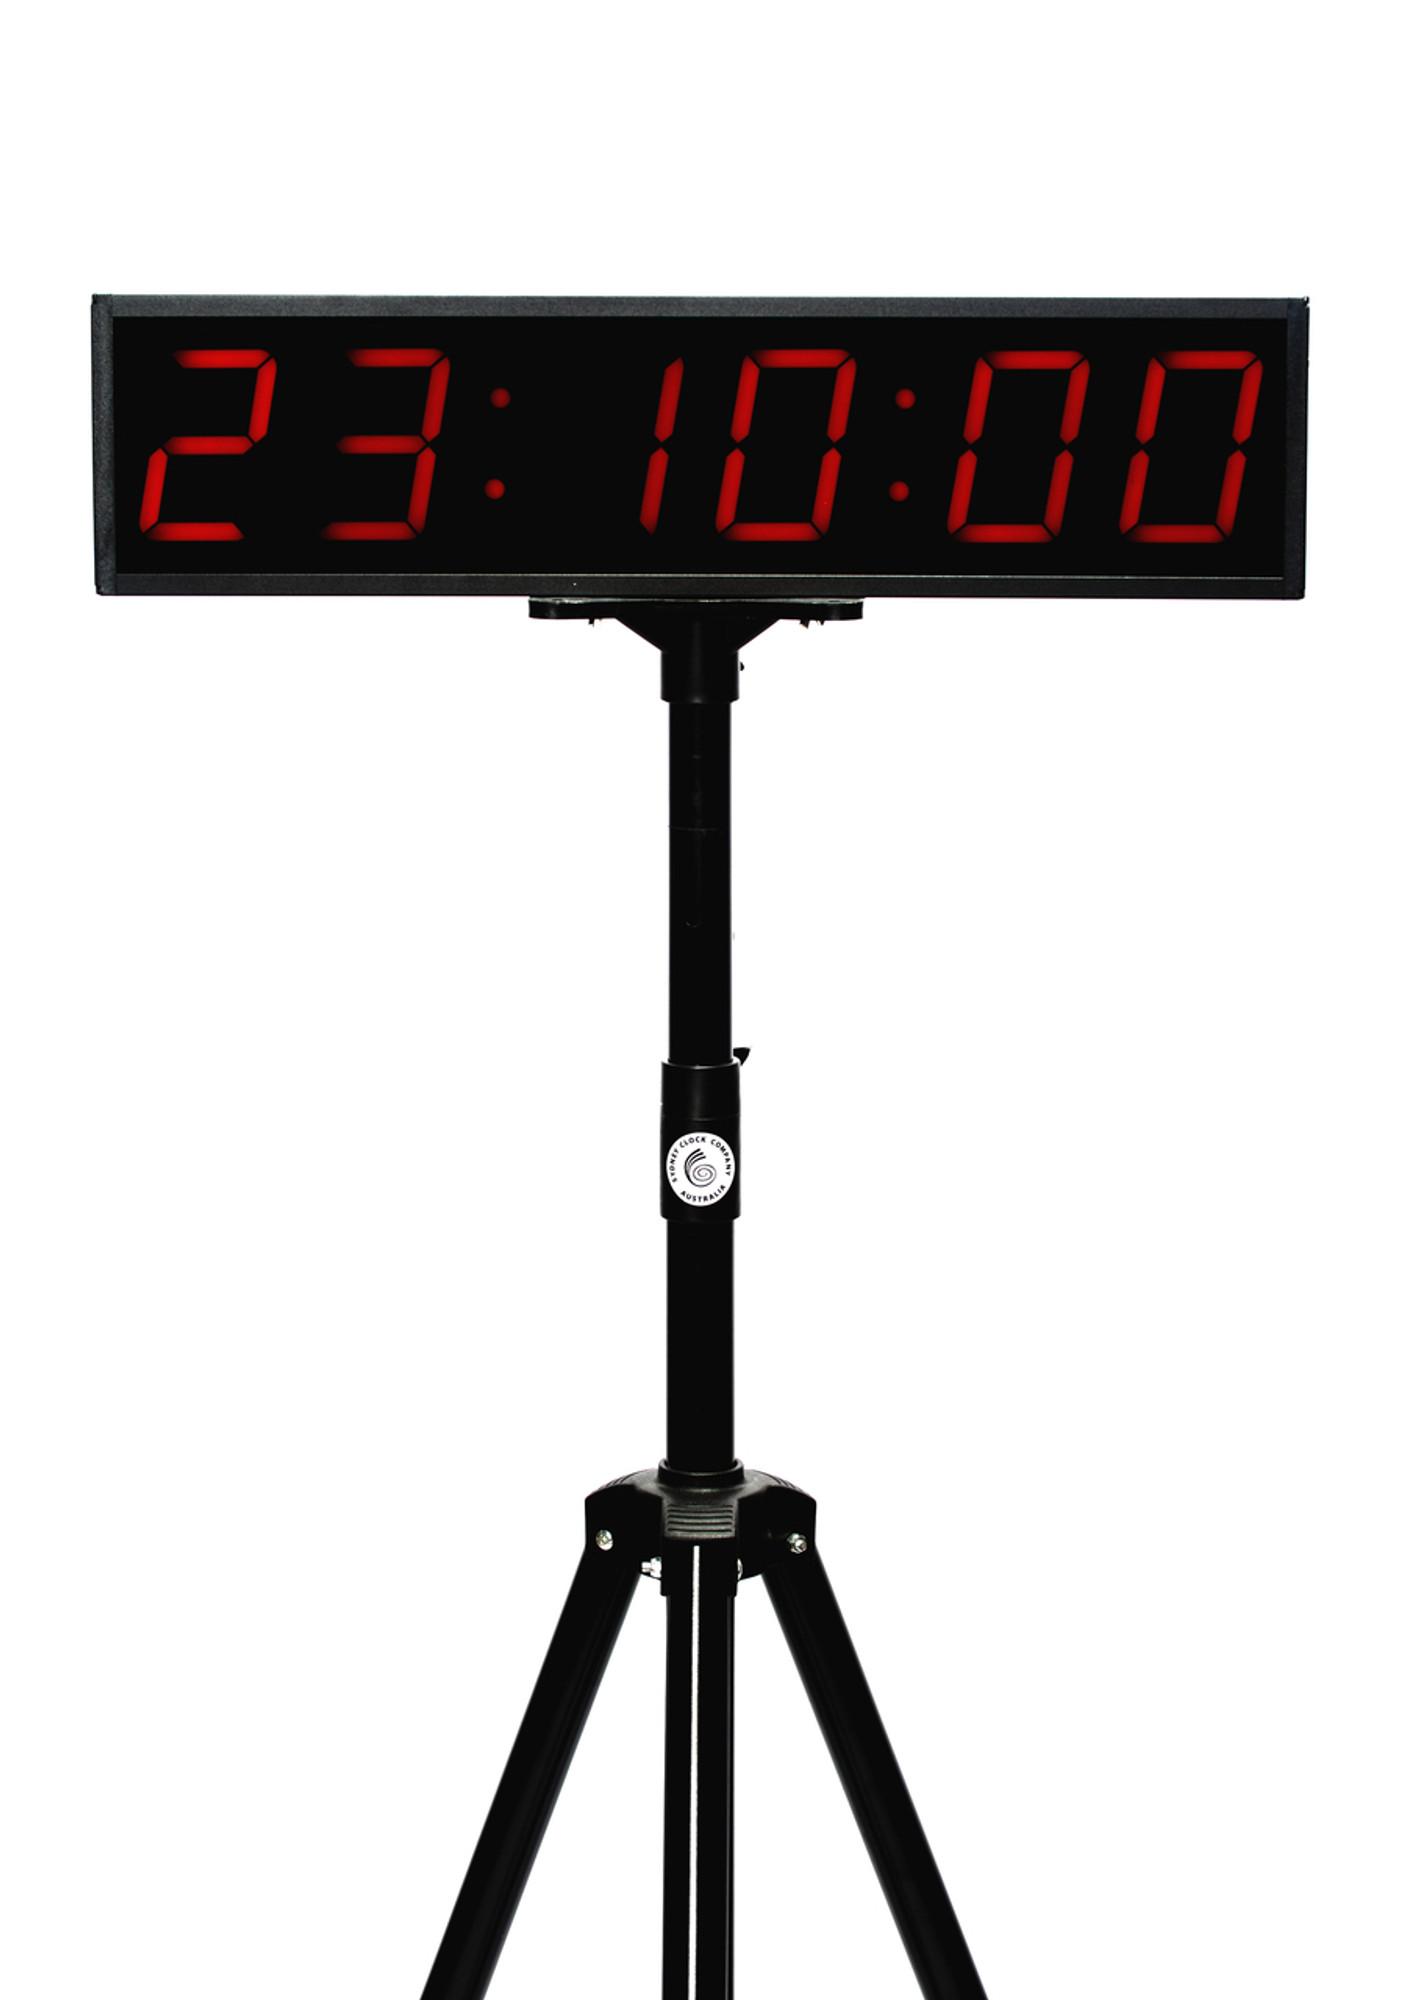 Rose Glen North Dakota ⁓ Try These Large Classroom Digital Timer